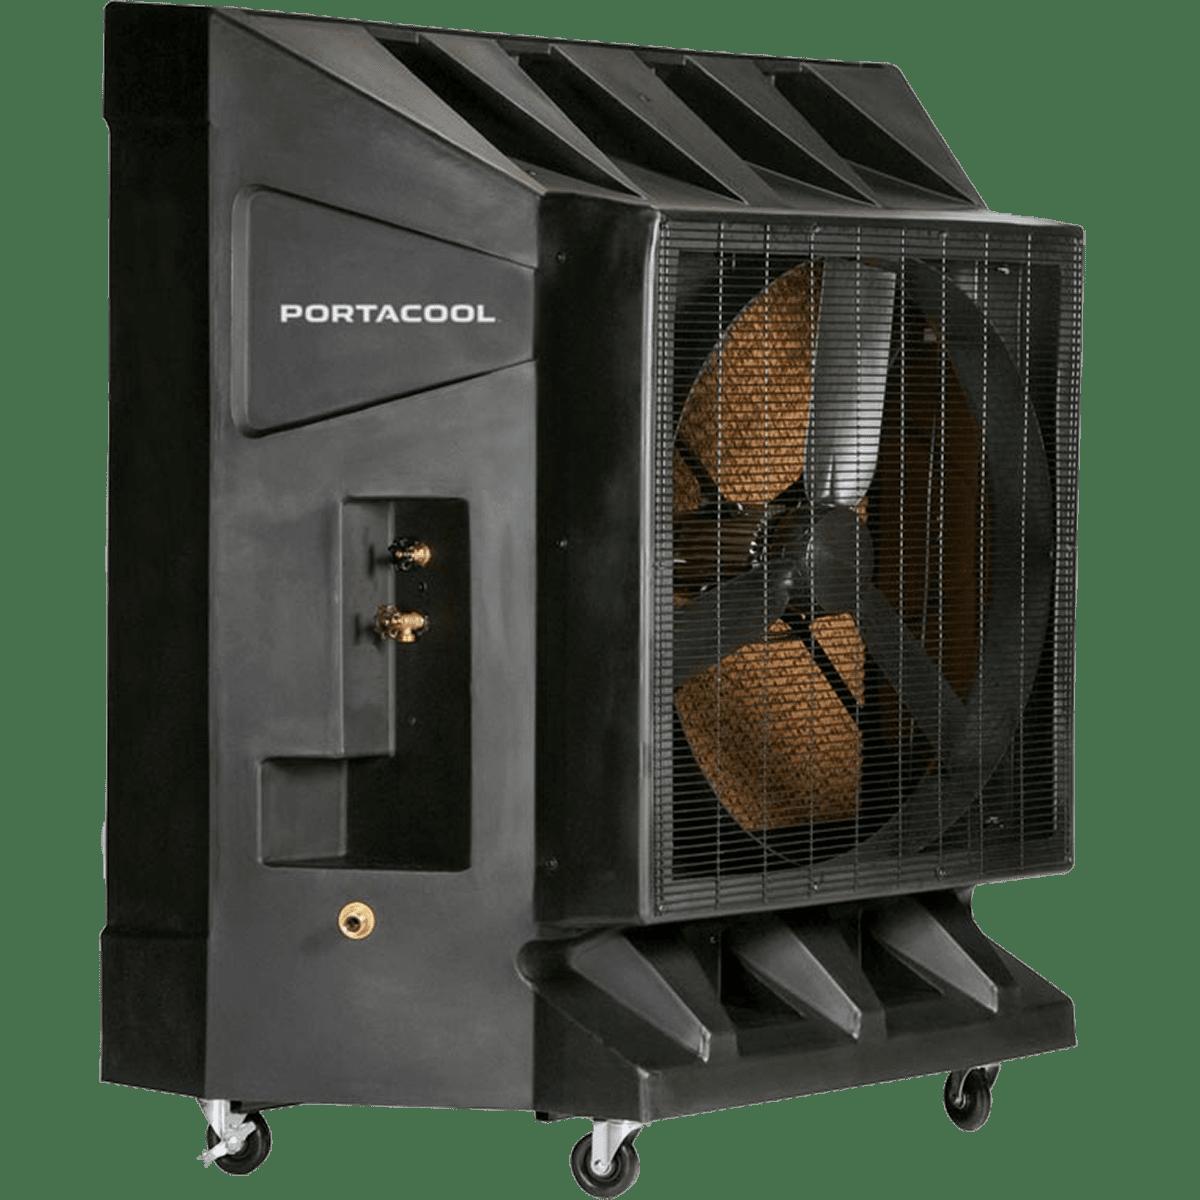 Portacool 36-Inch Evaporative Cooler 1 Speed po2142